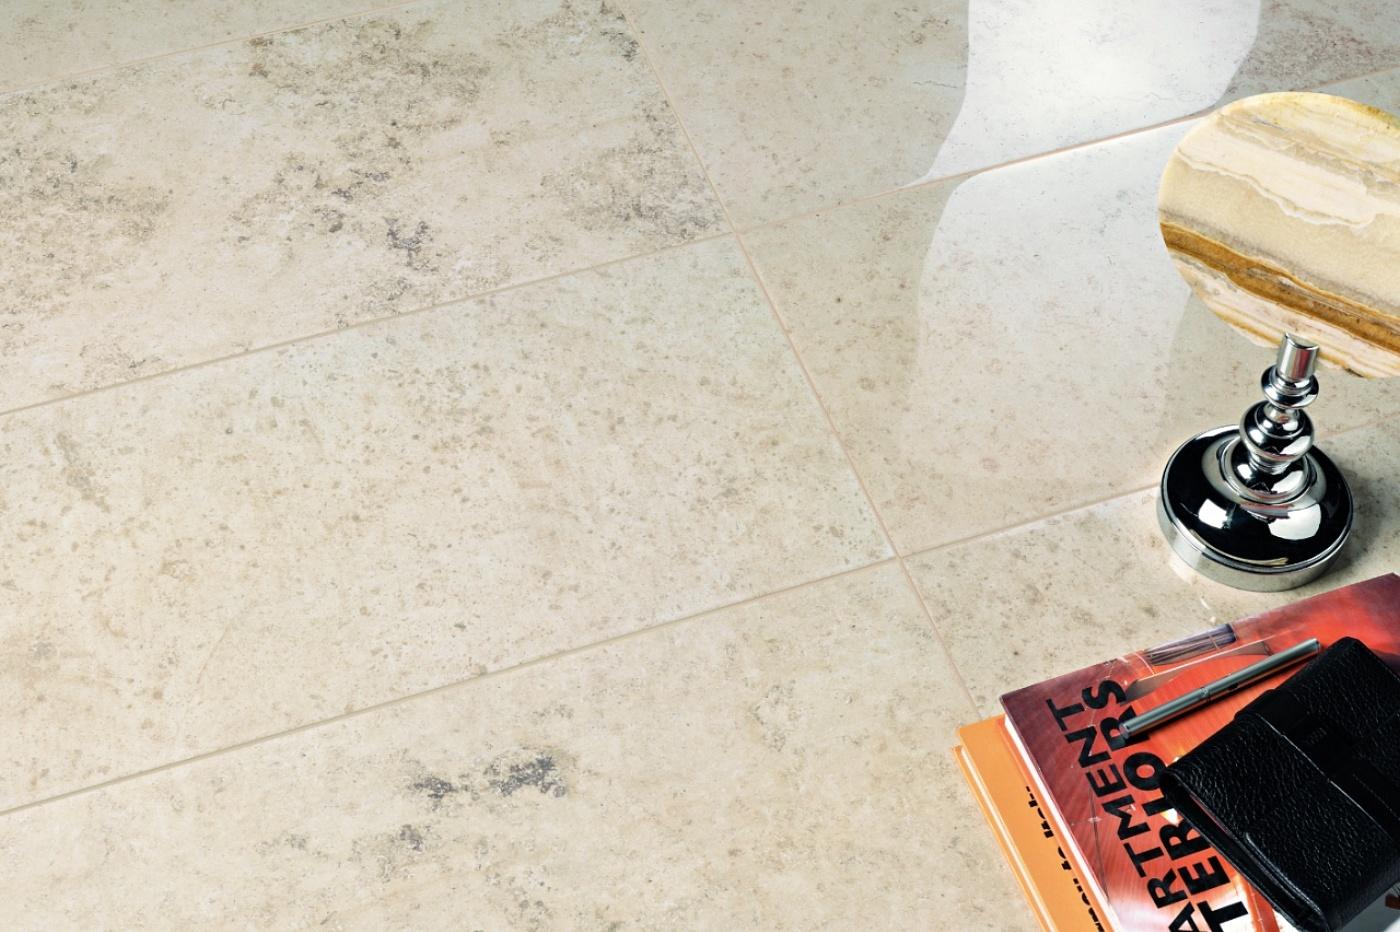 Serenissima cir industrie ceramiche spa jura u003eu003e trovapavimenti.it